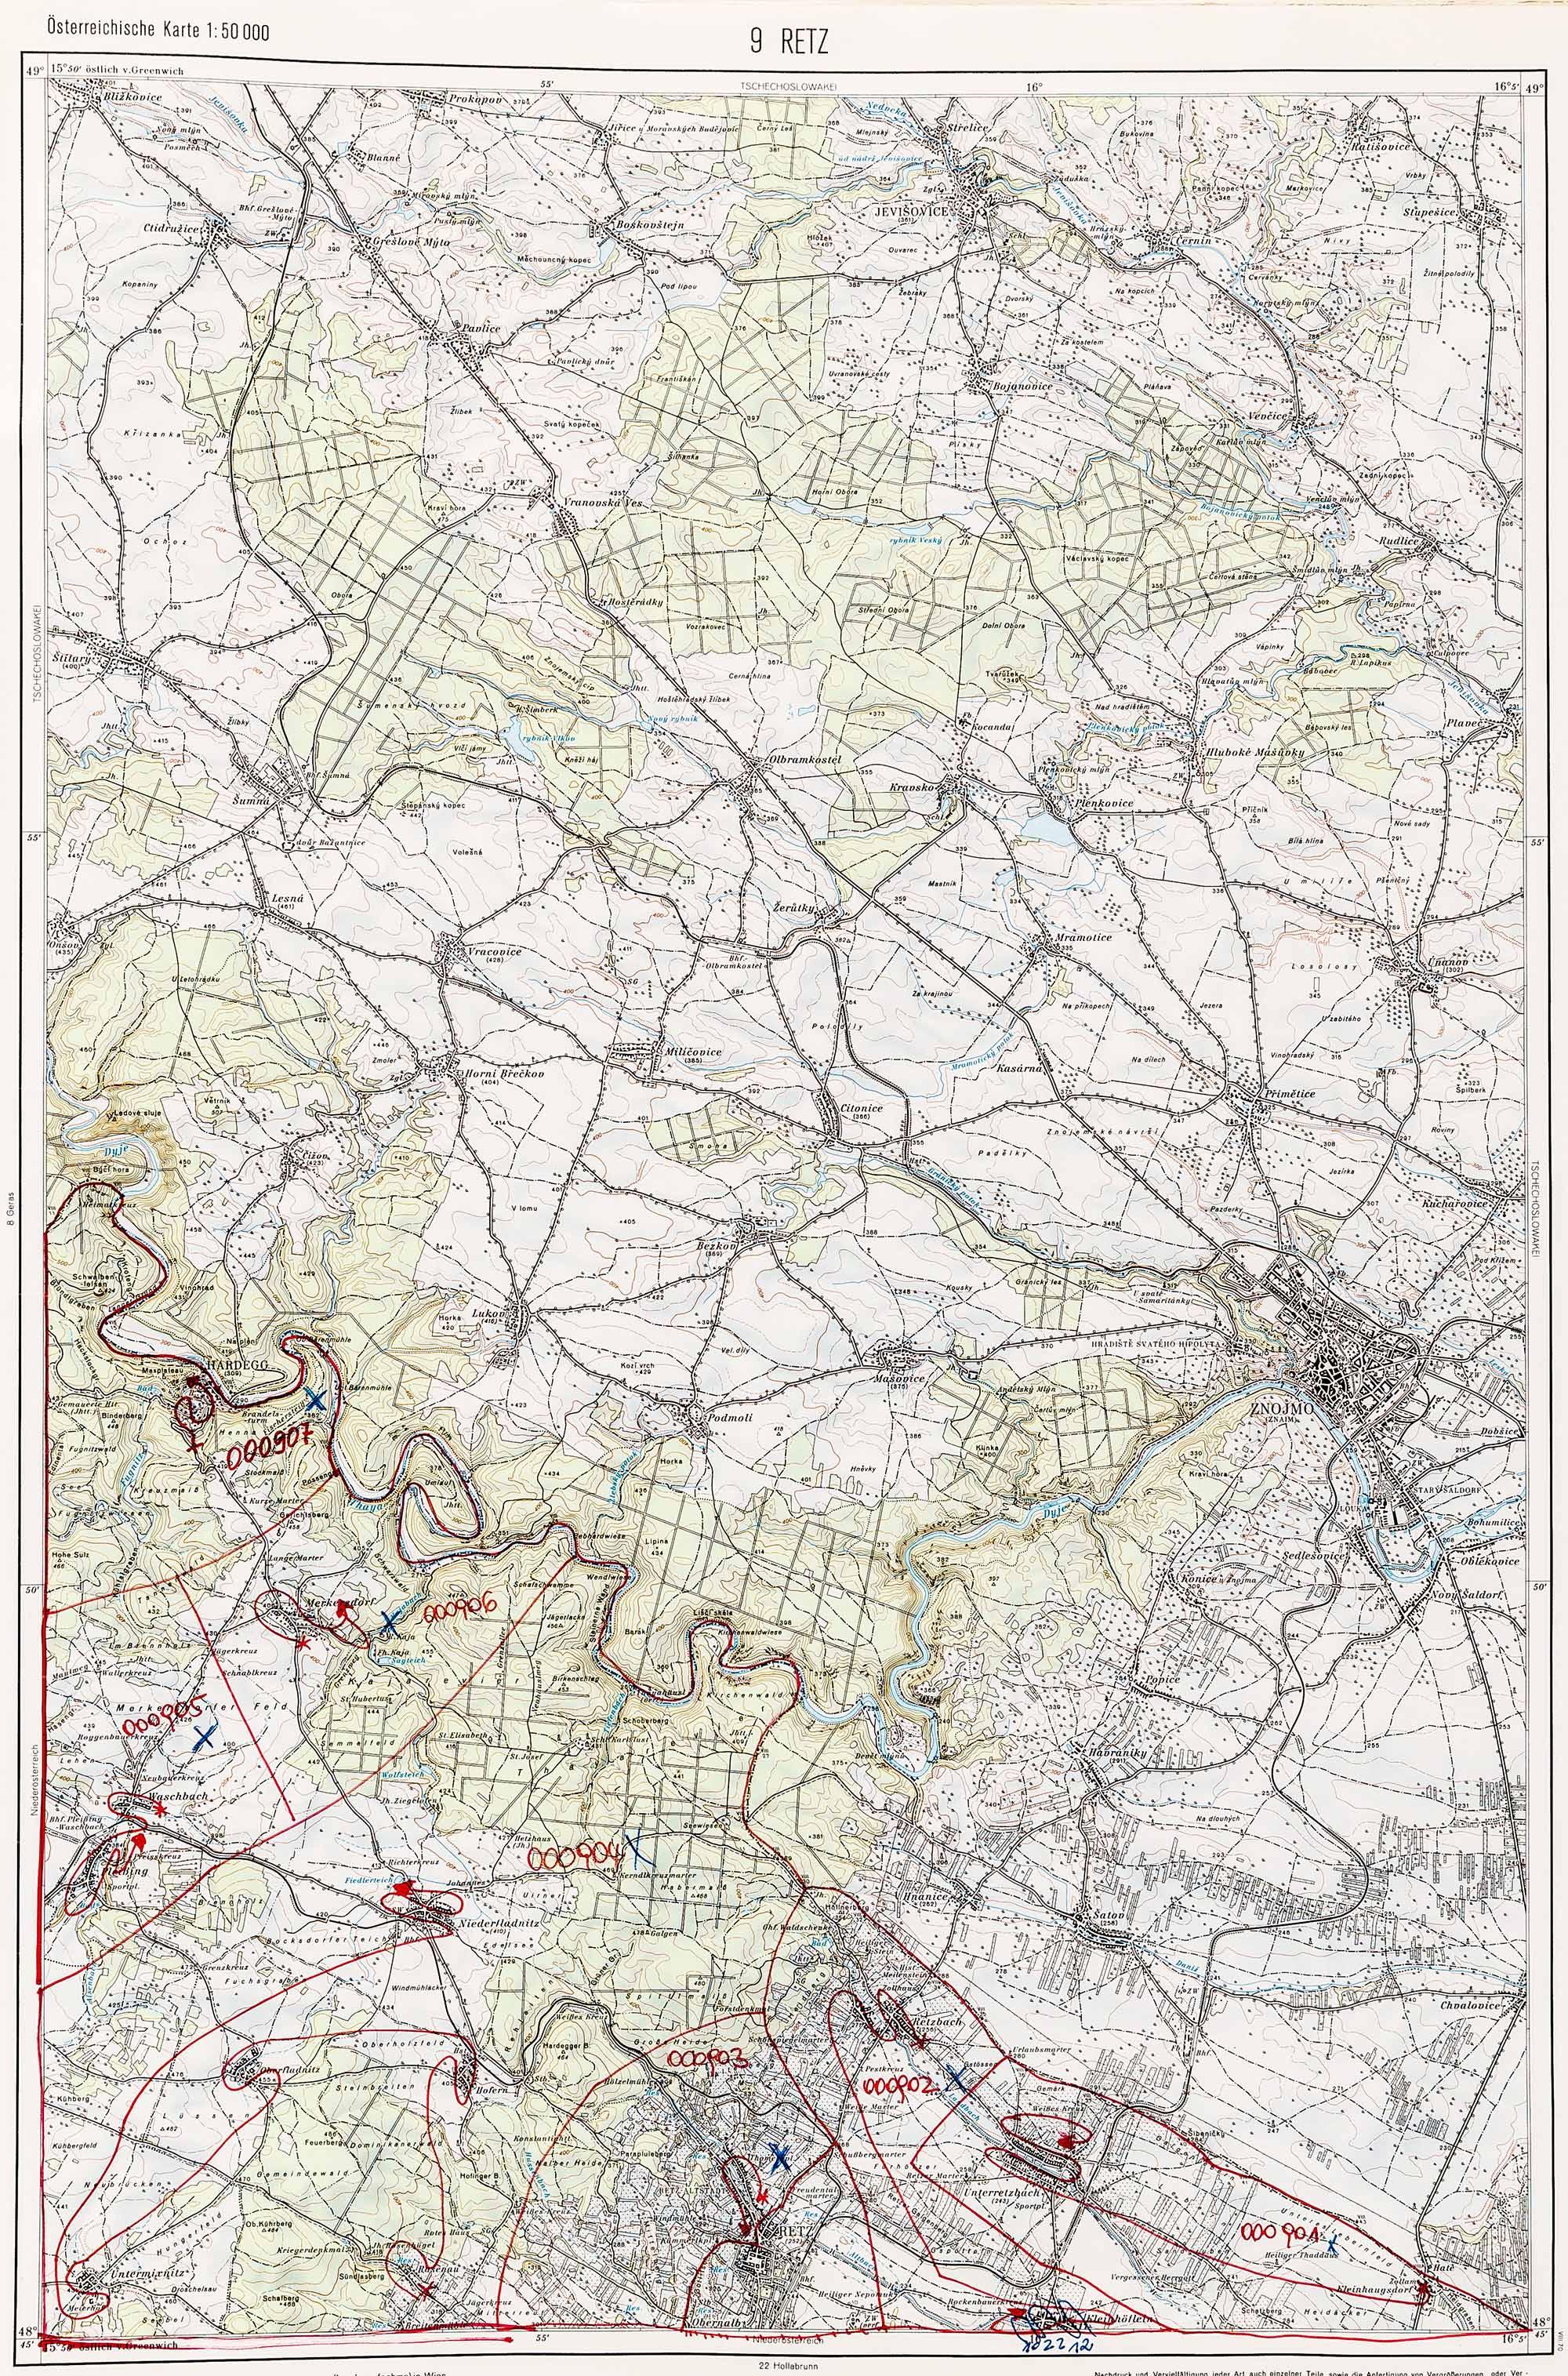 1979-1982 Karte 009